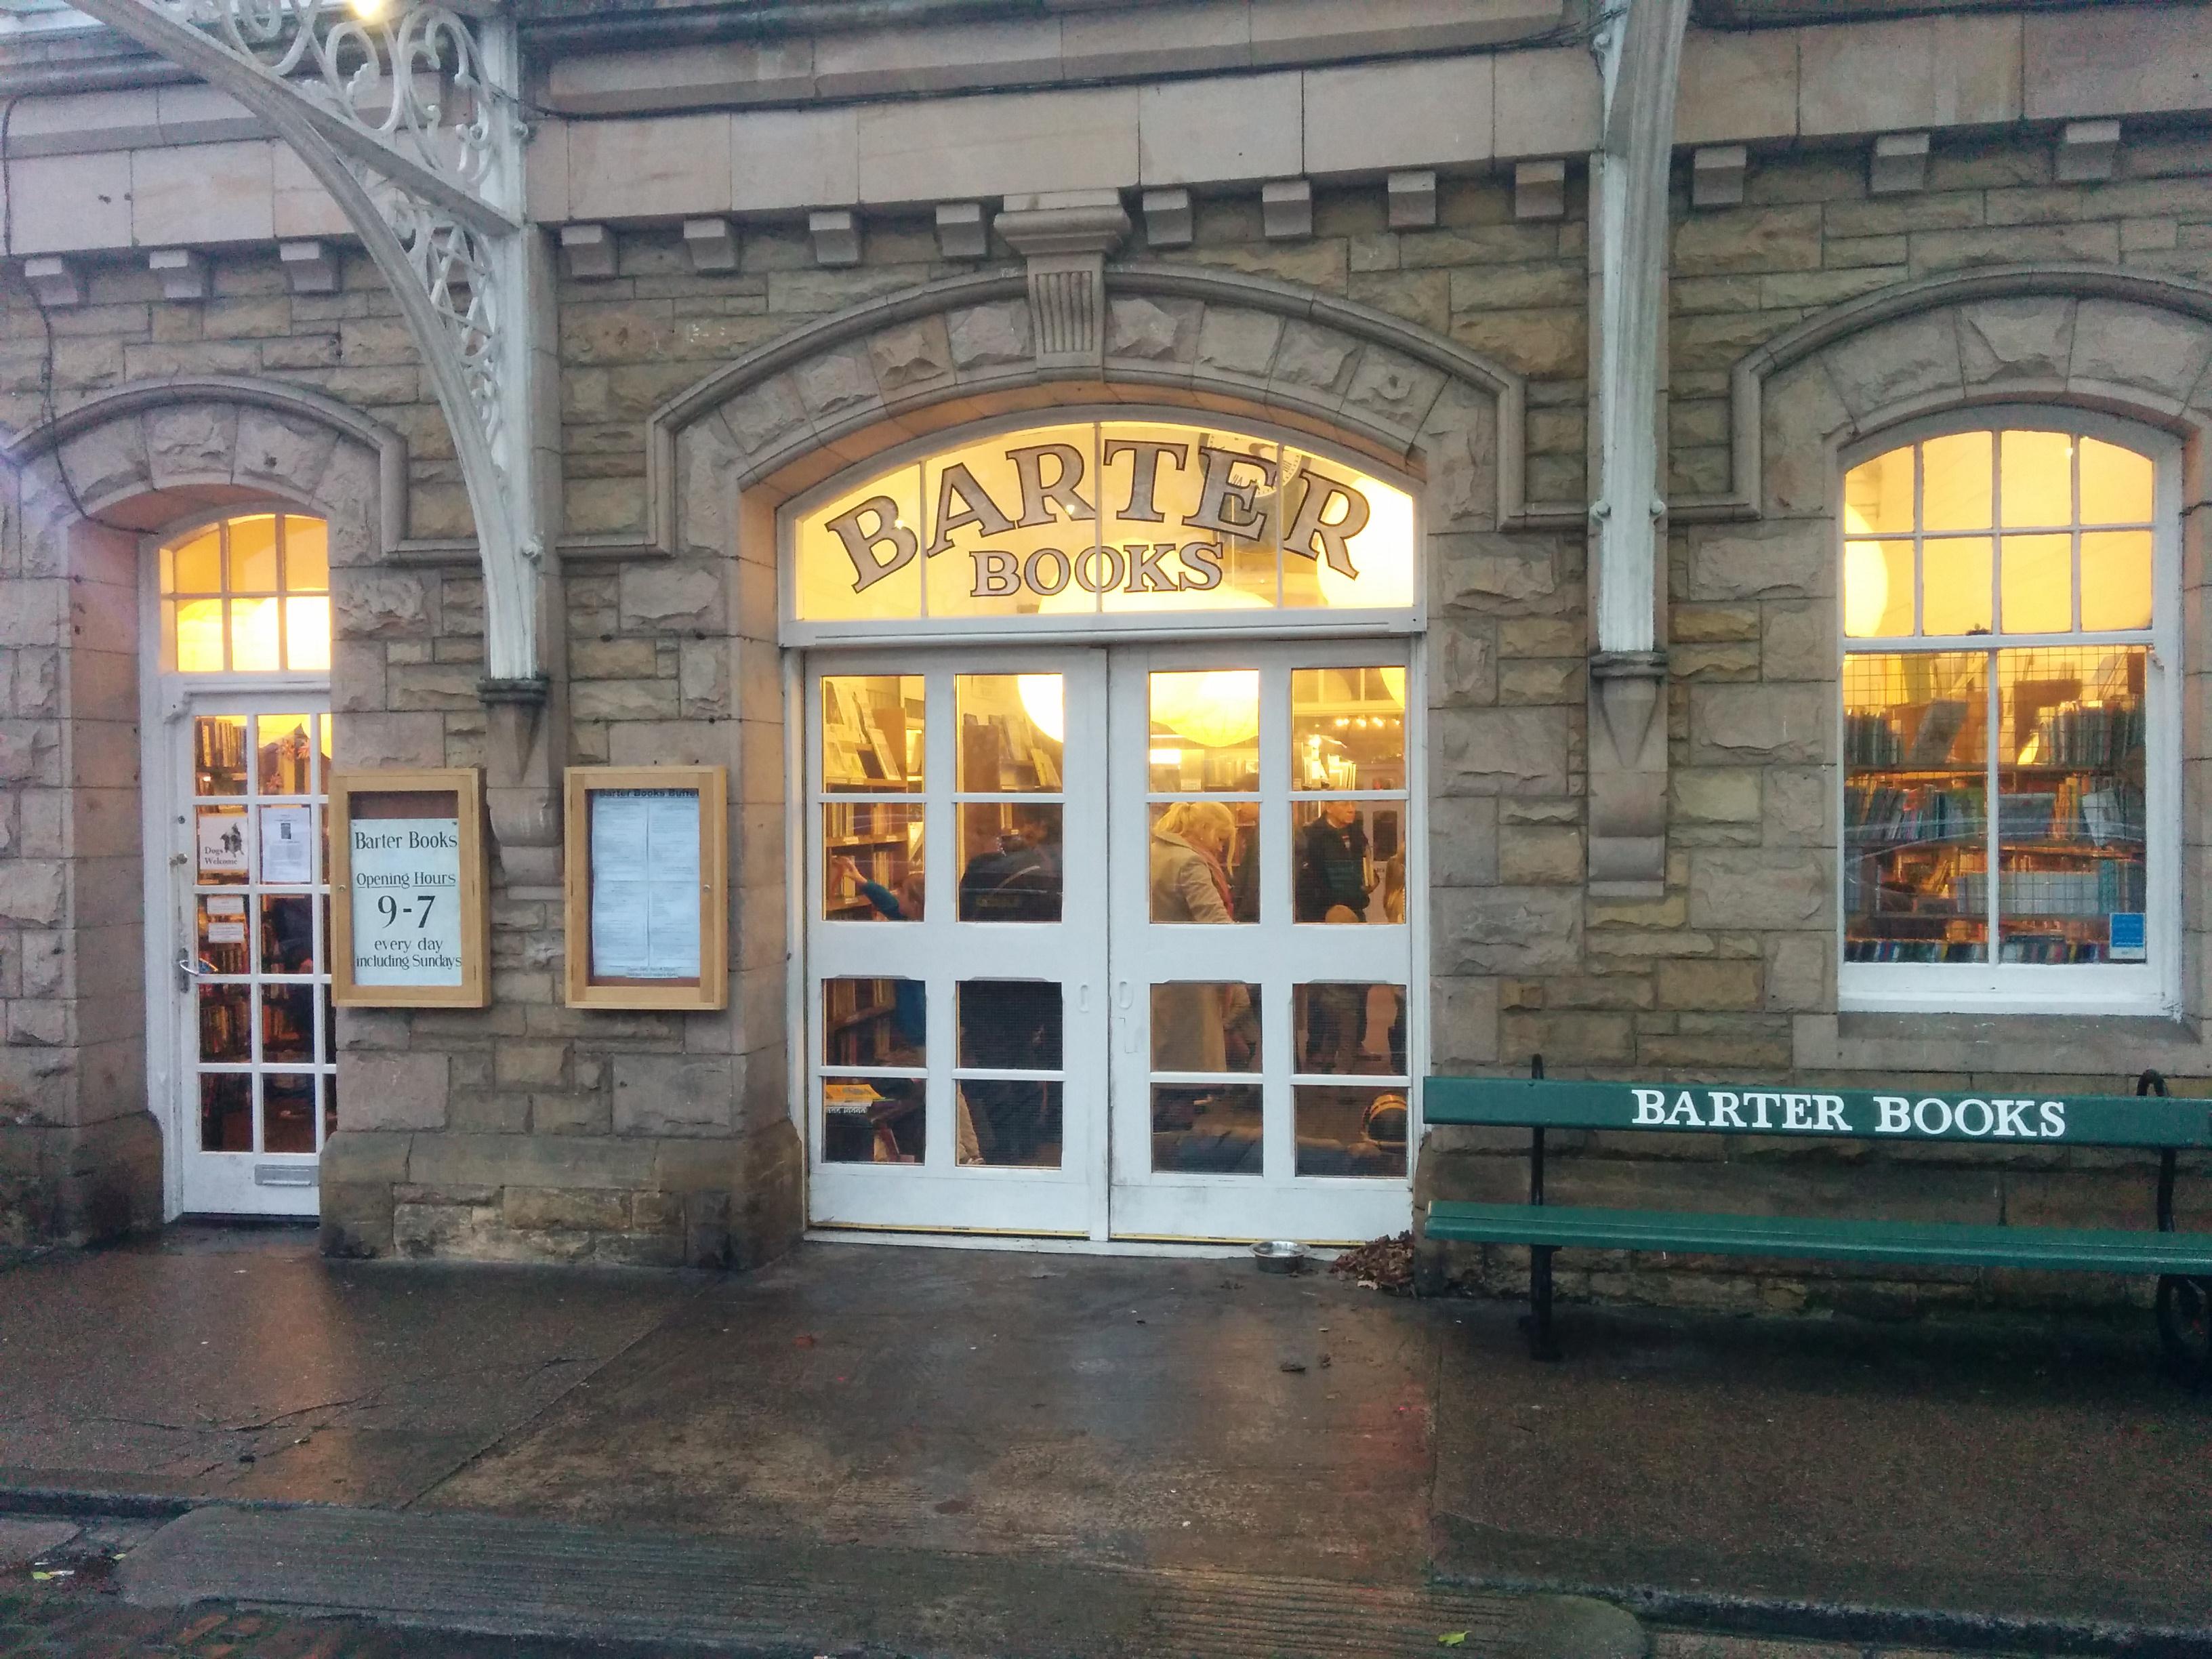 Barter Books - Wikipedia